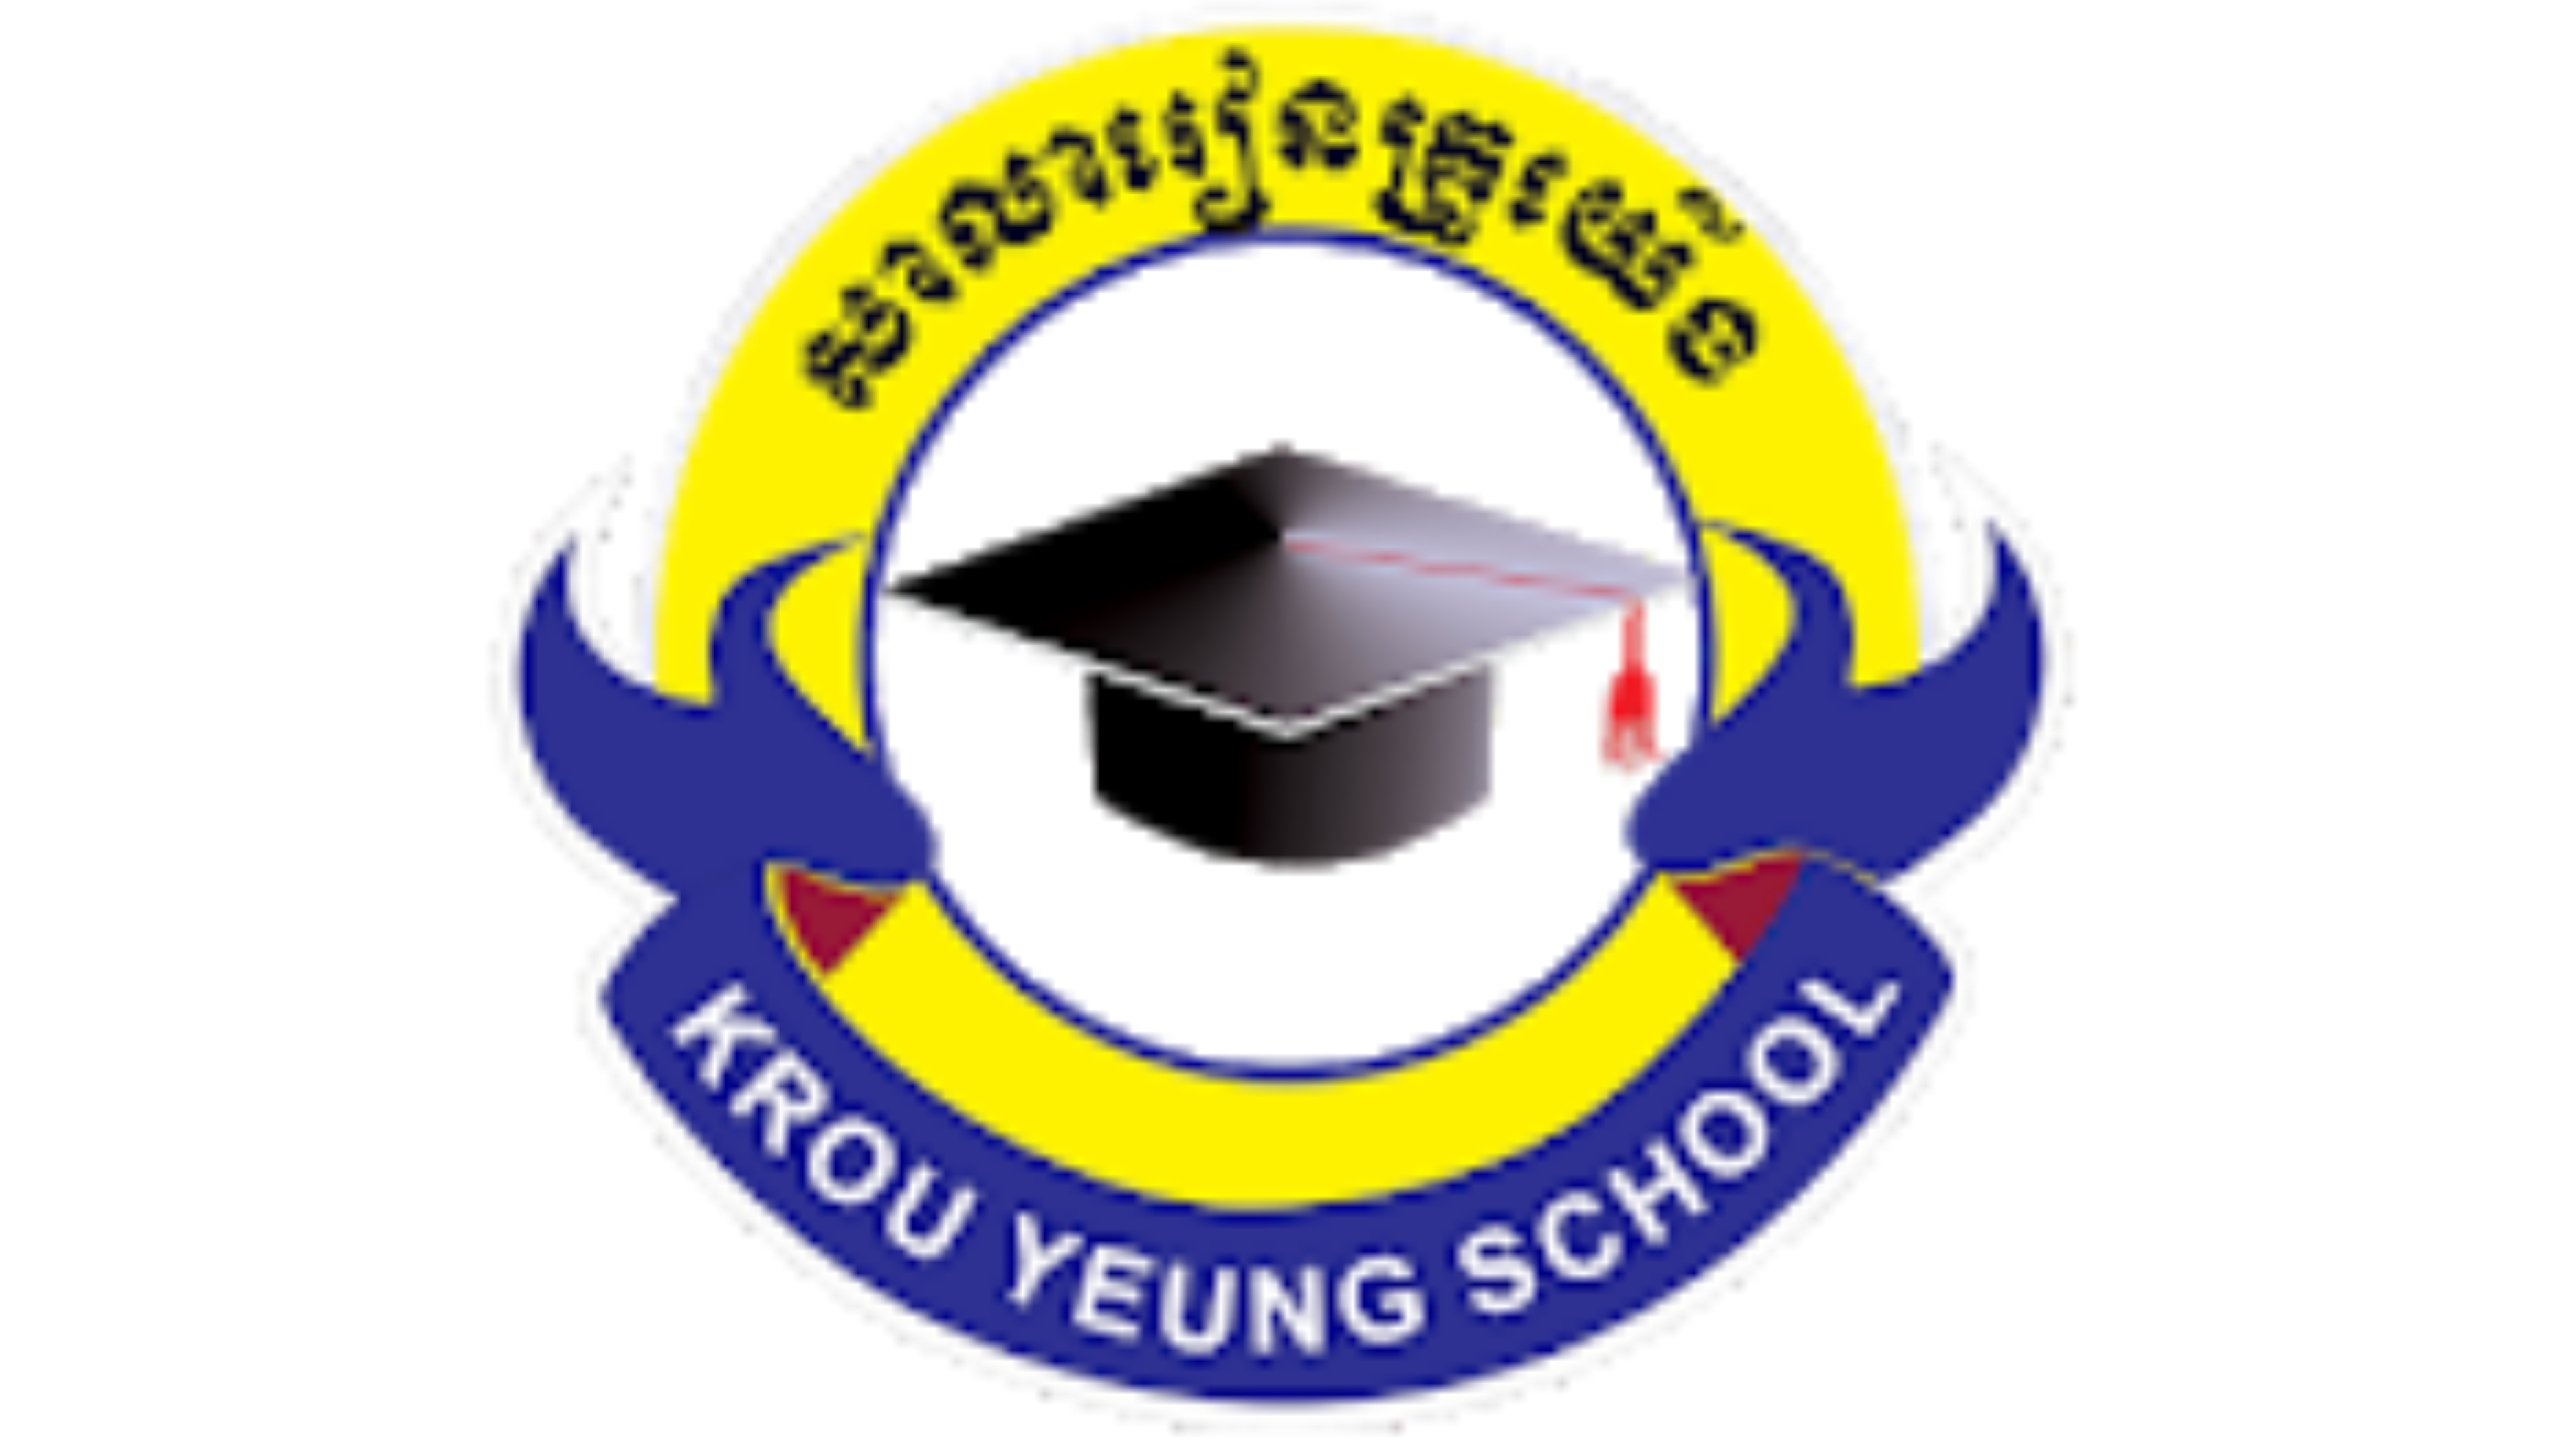 Krou Yeung School APK